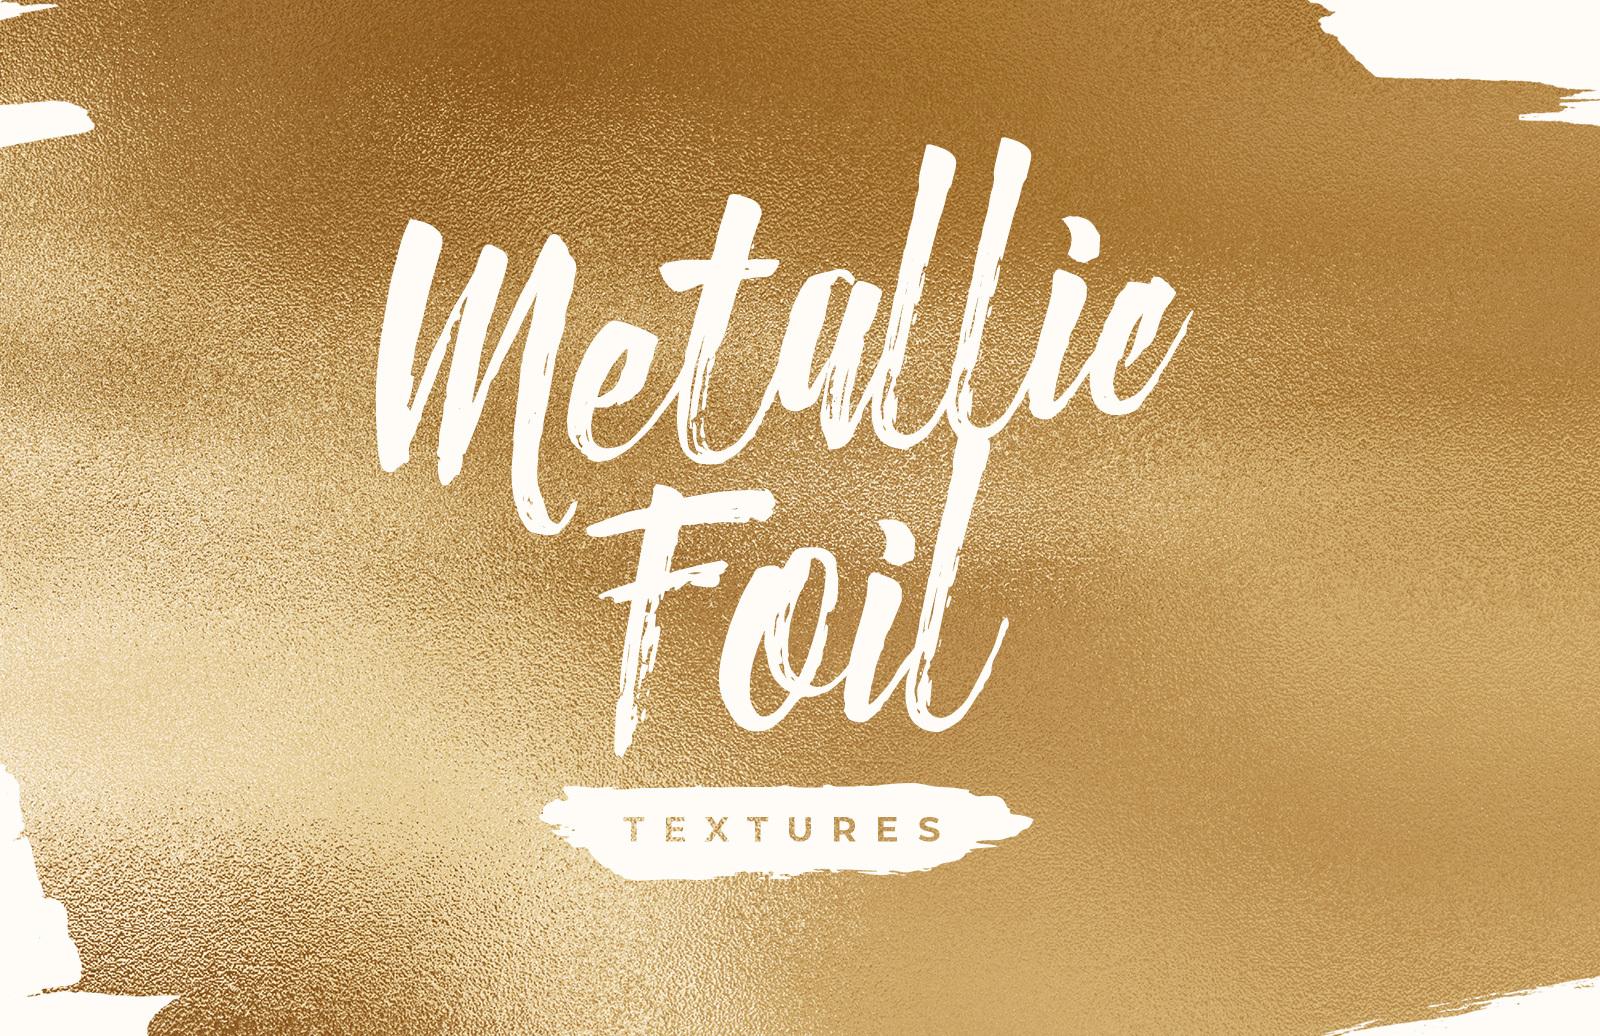 Metallic Foil Textures Preview 1A